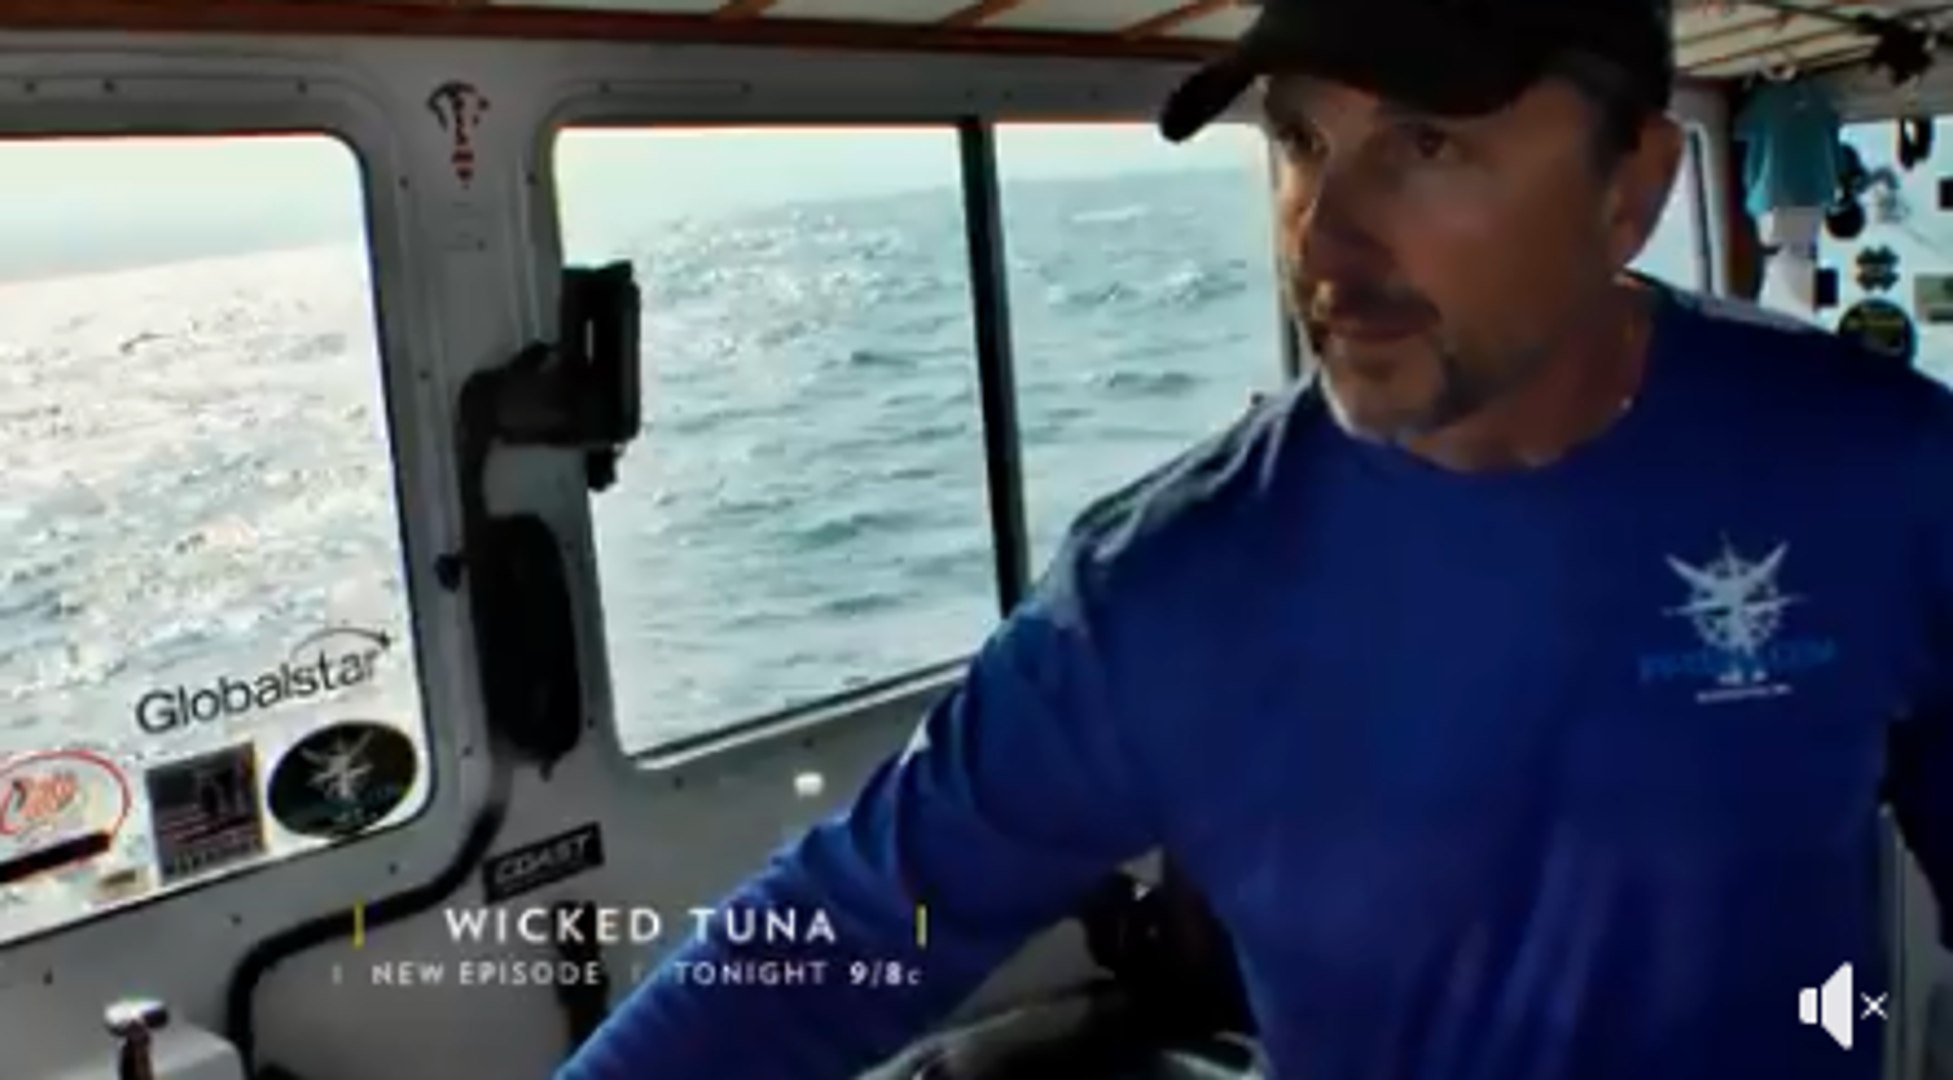 wicked tuna season 7 watch online free